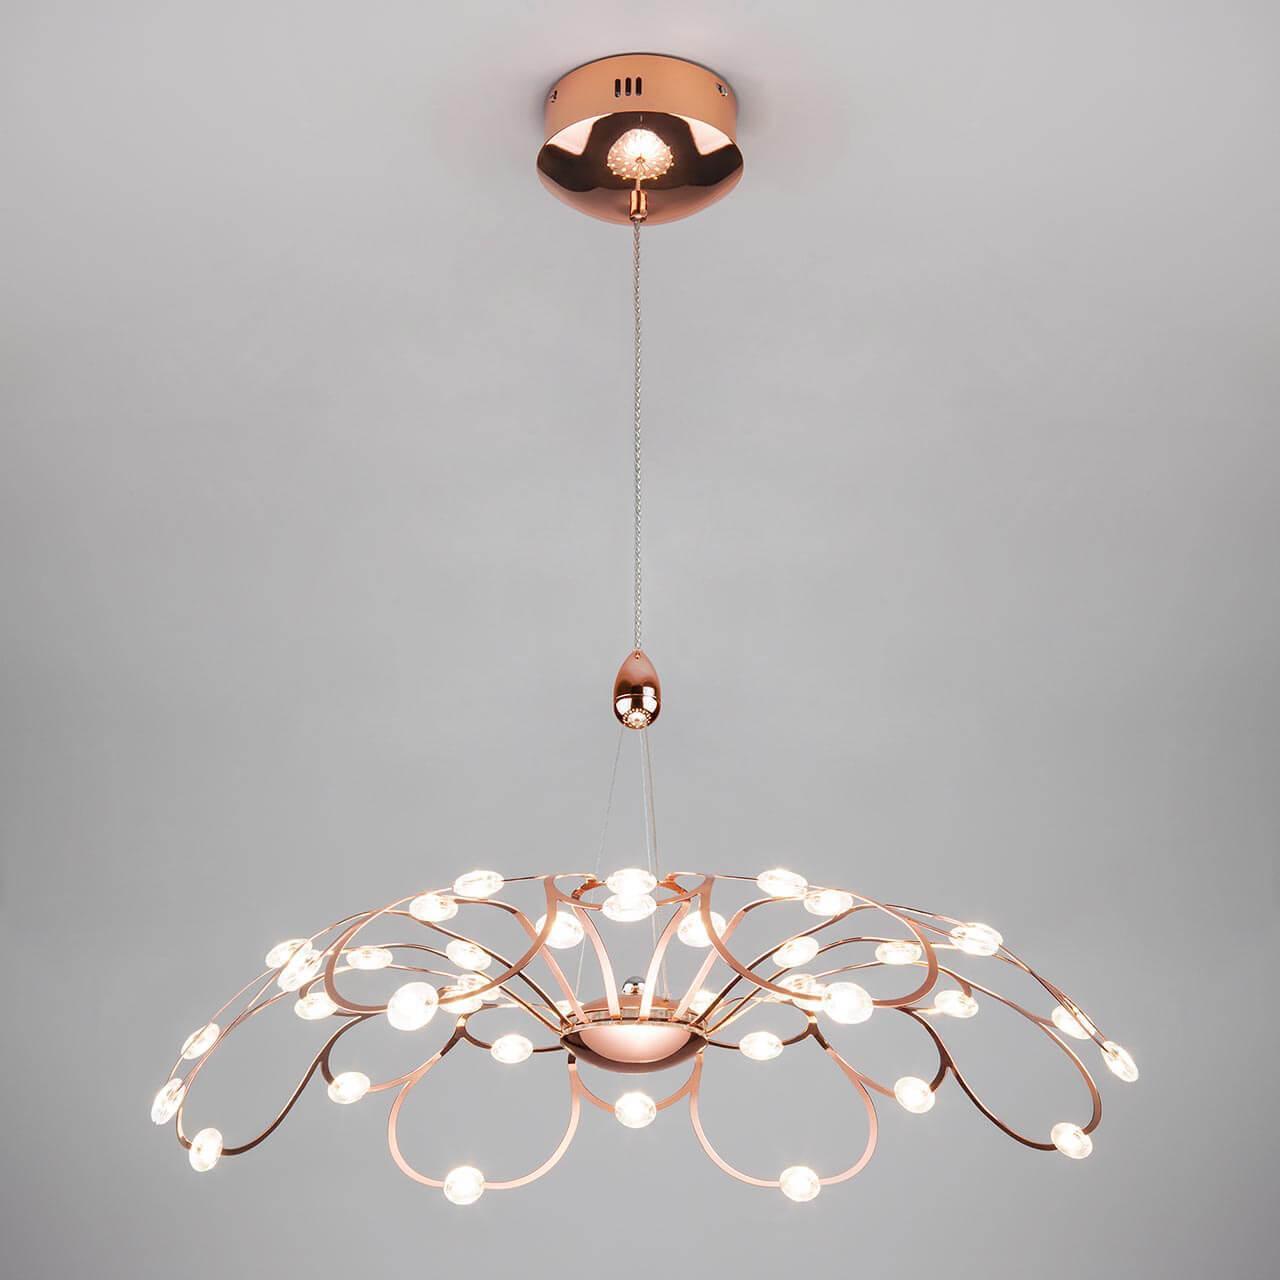 Подвесной светильник Bogates 441/1, LED, 28.5 Вт